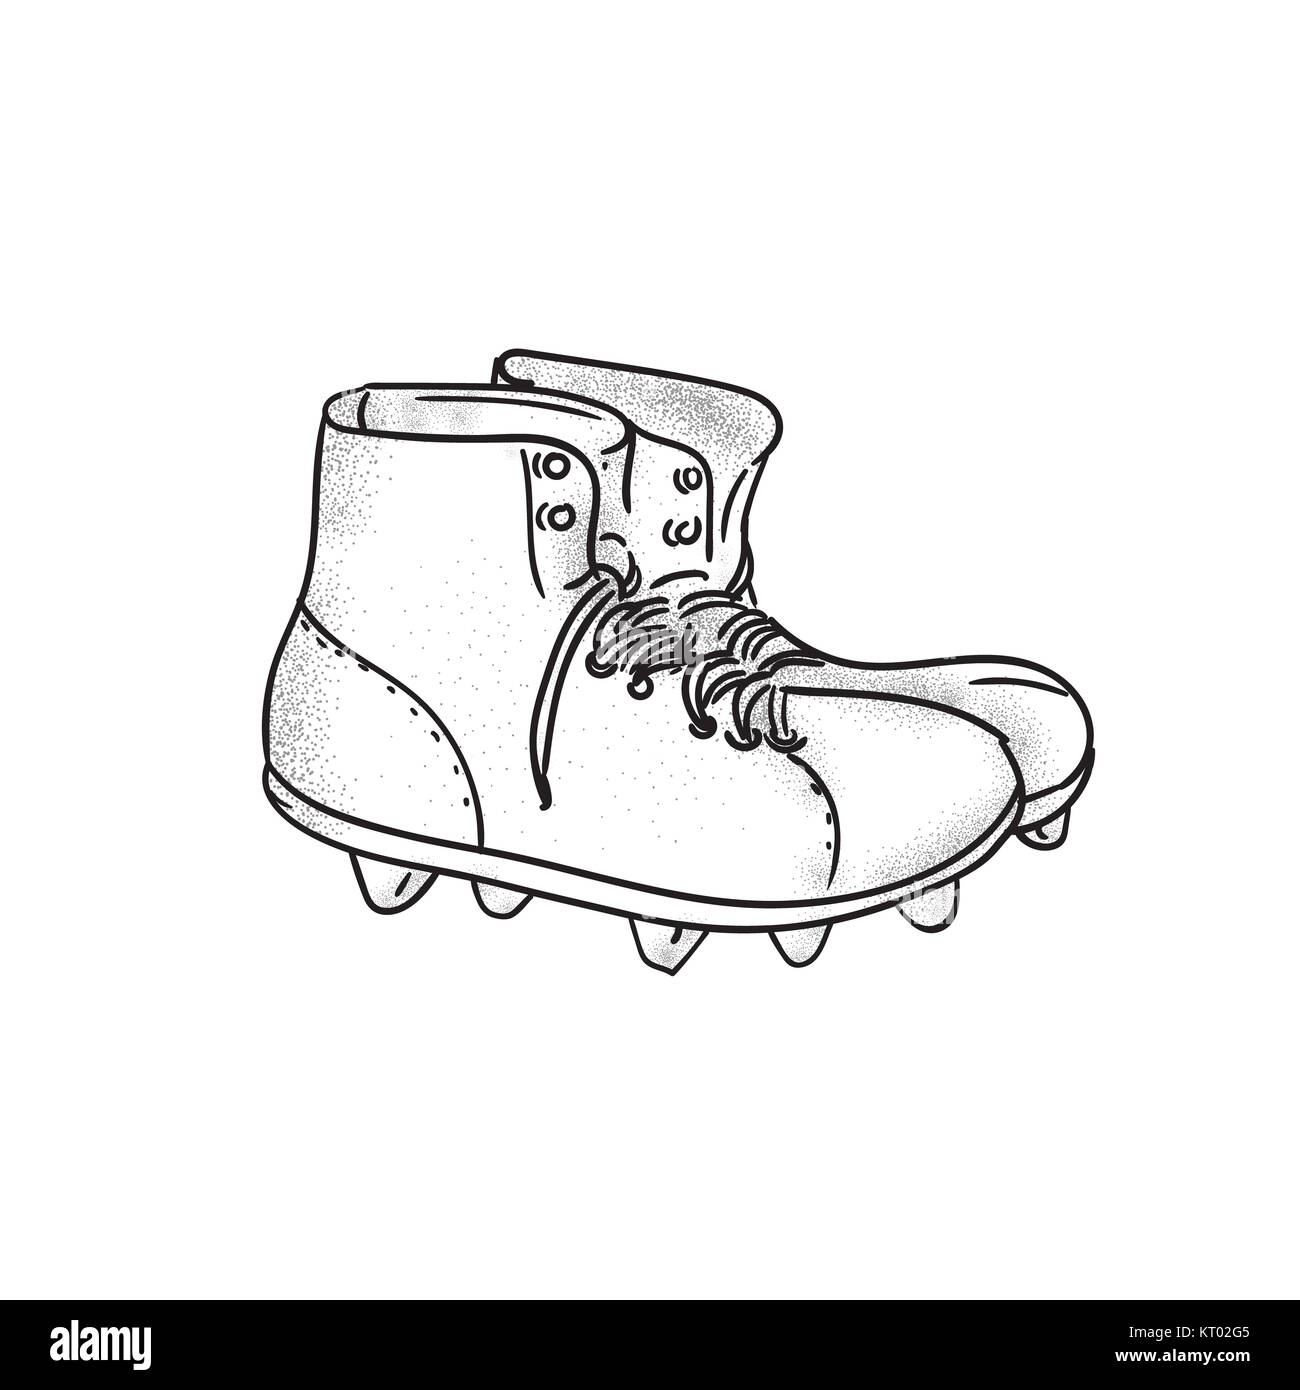 Vintage Football Boots Stockfotos & Vintage Football Boots